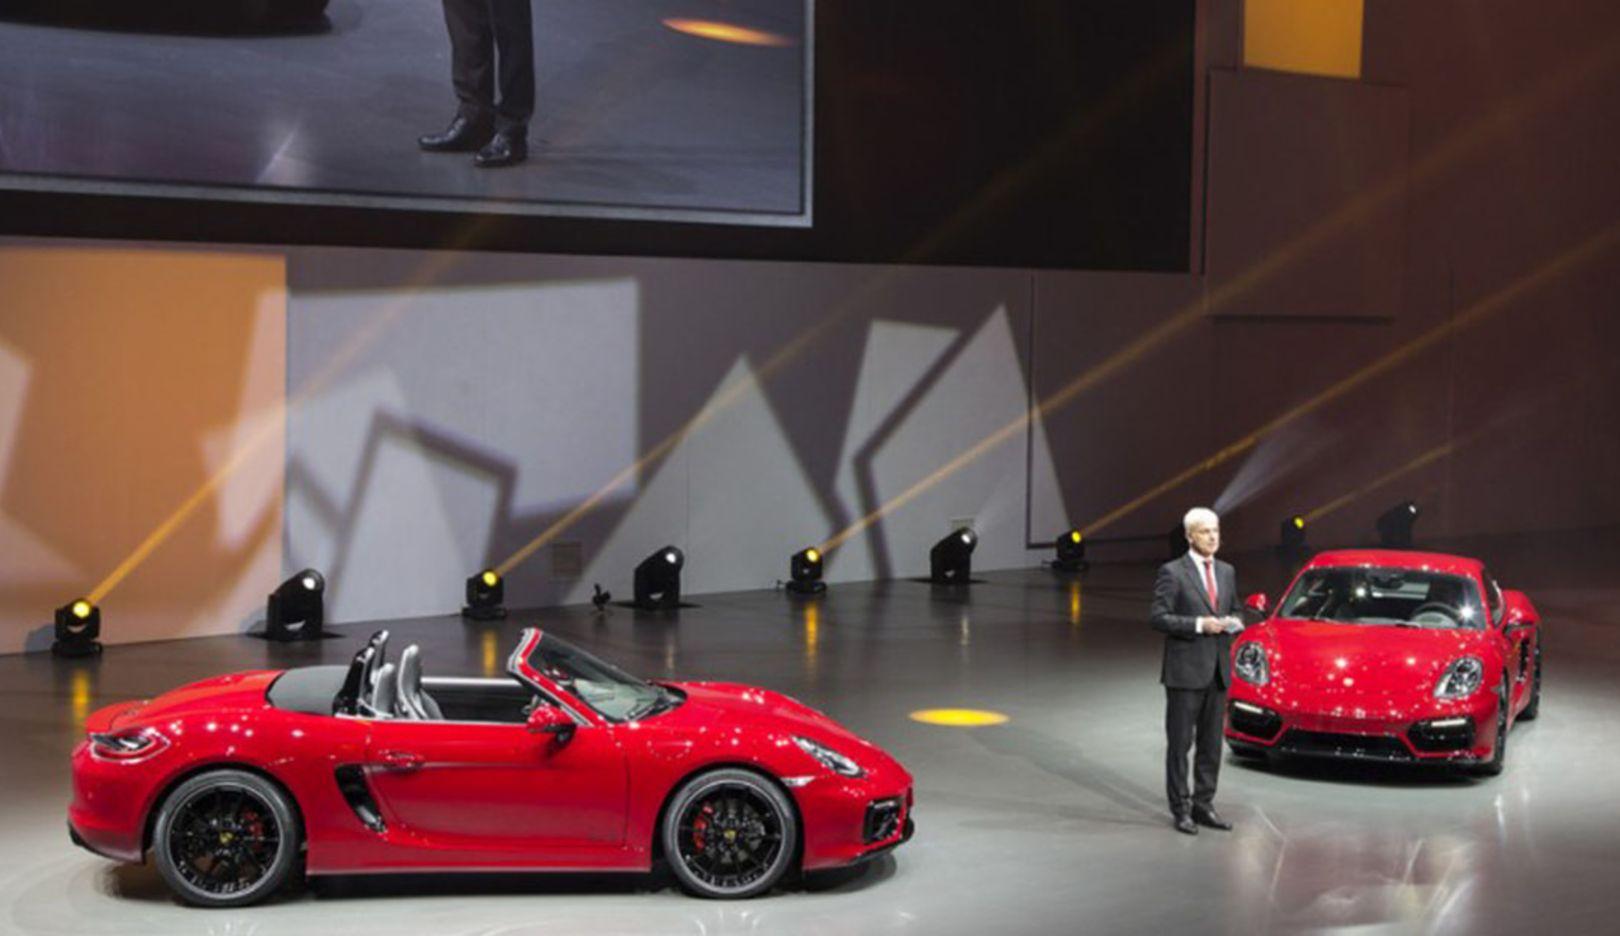 Matthias Müller, Vorstandsvorsitzender, Boxster GTS, Cayman GTS, Auto China, Peking, 2014, Porsche AG